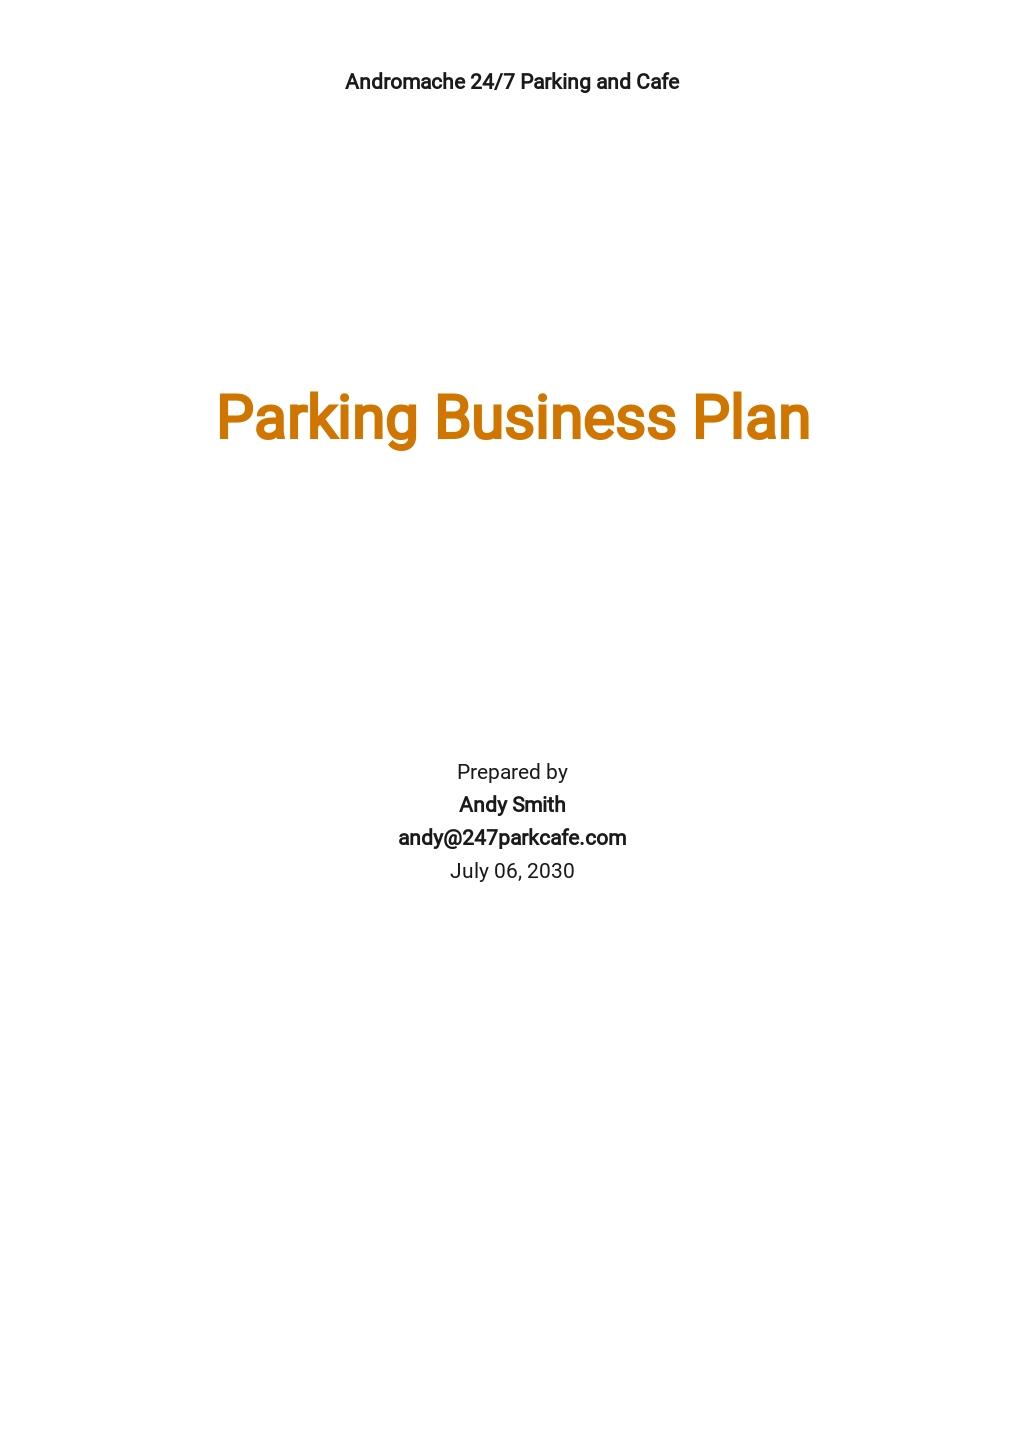 Parking or Valet Parking Business Plan Template